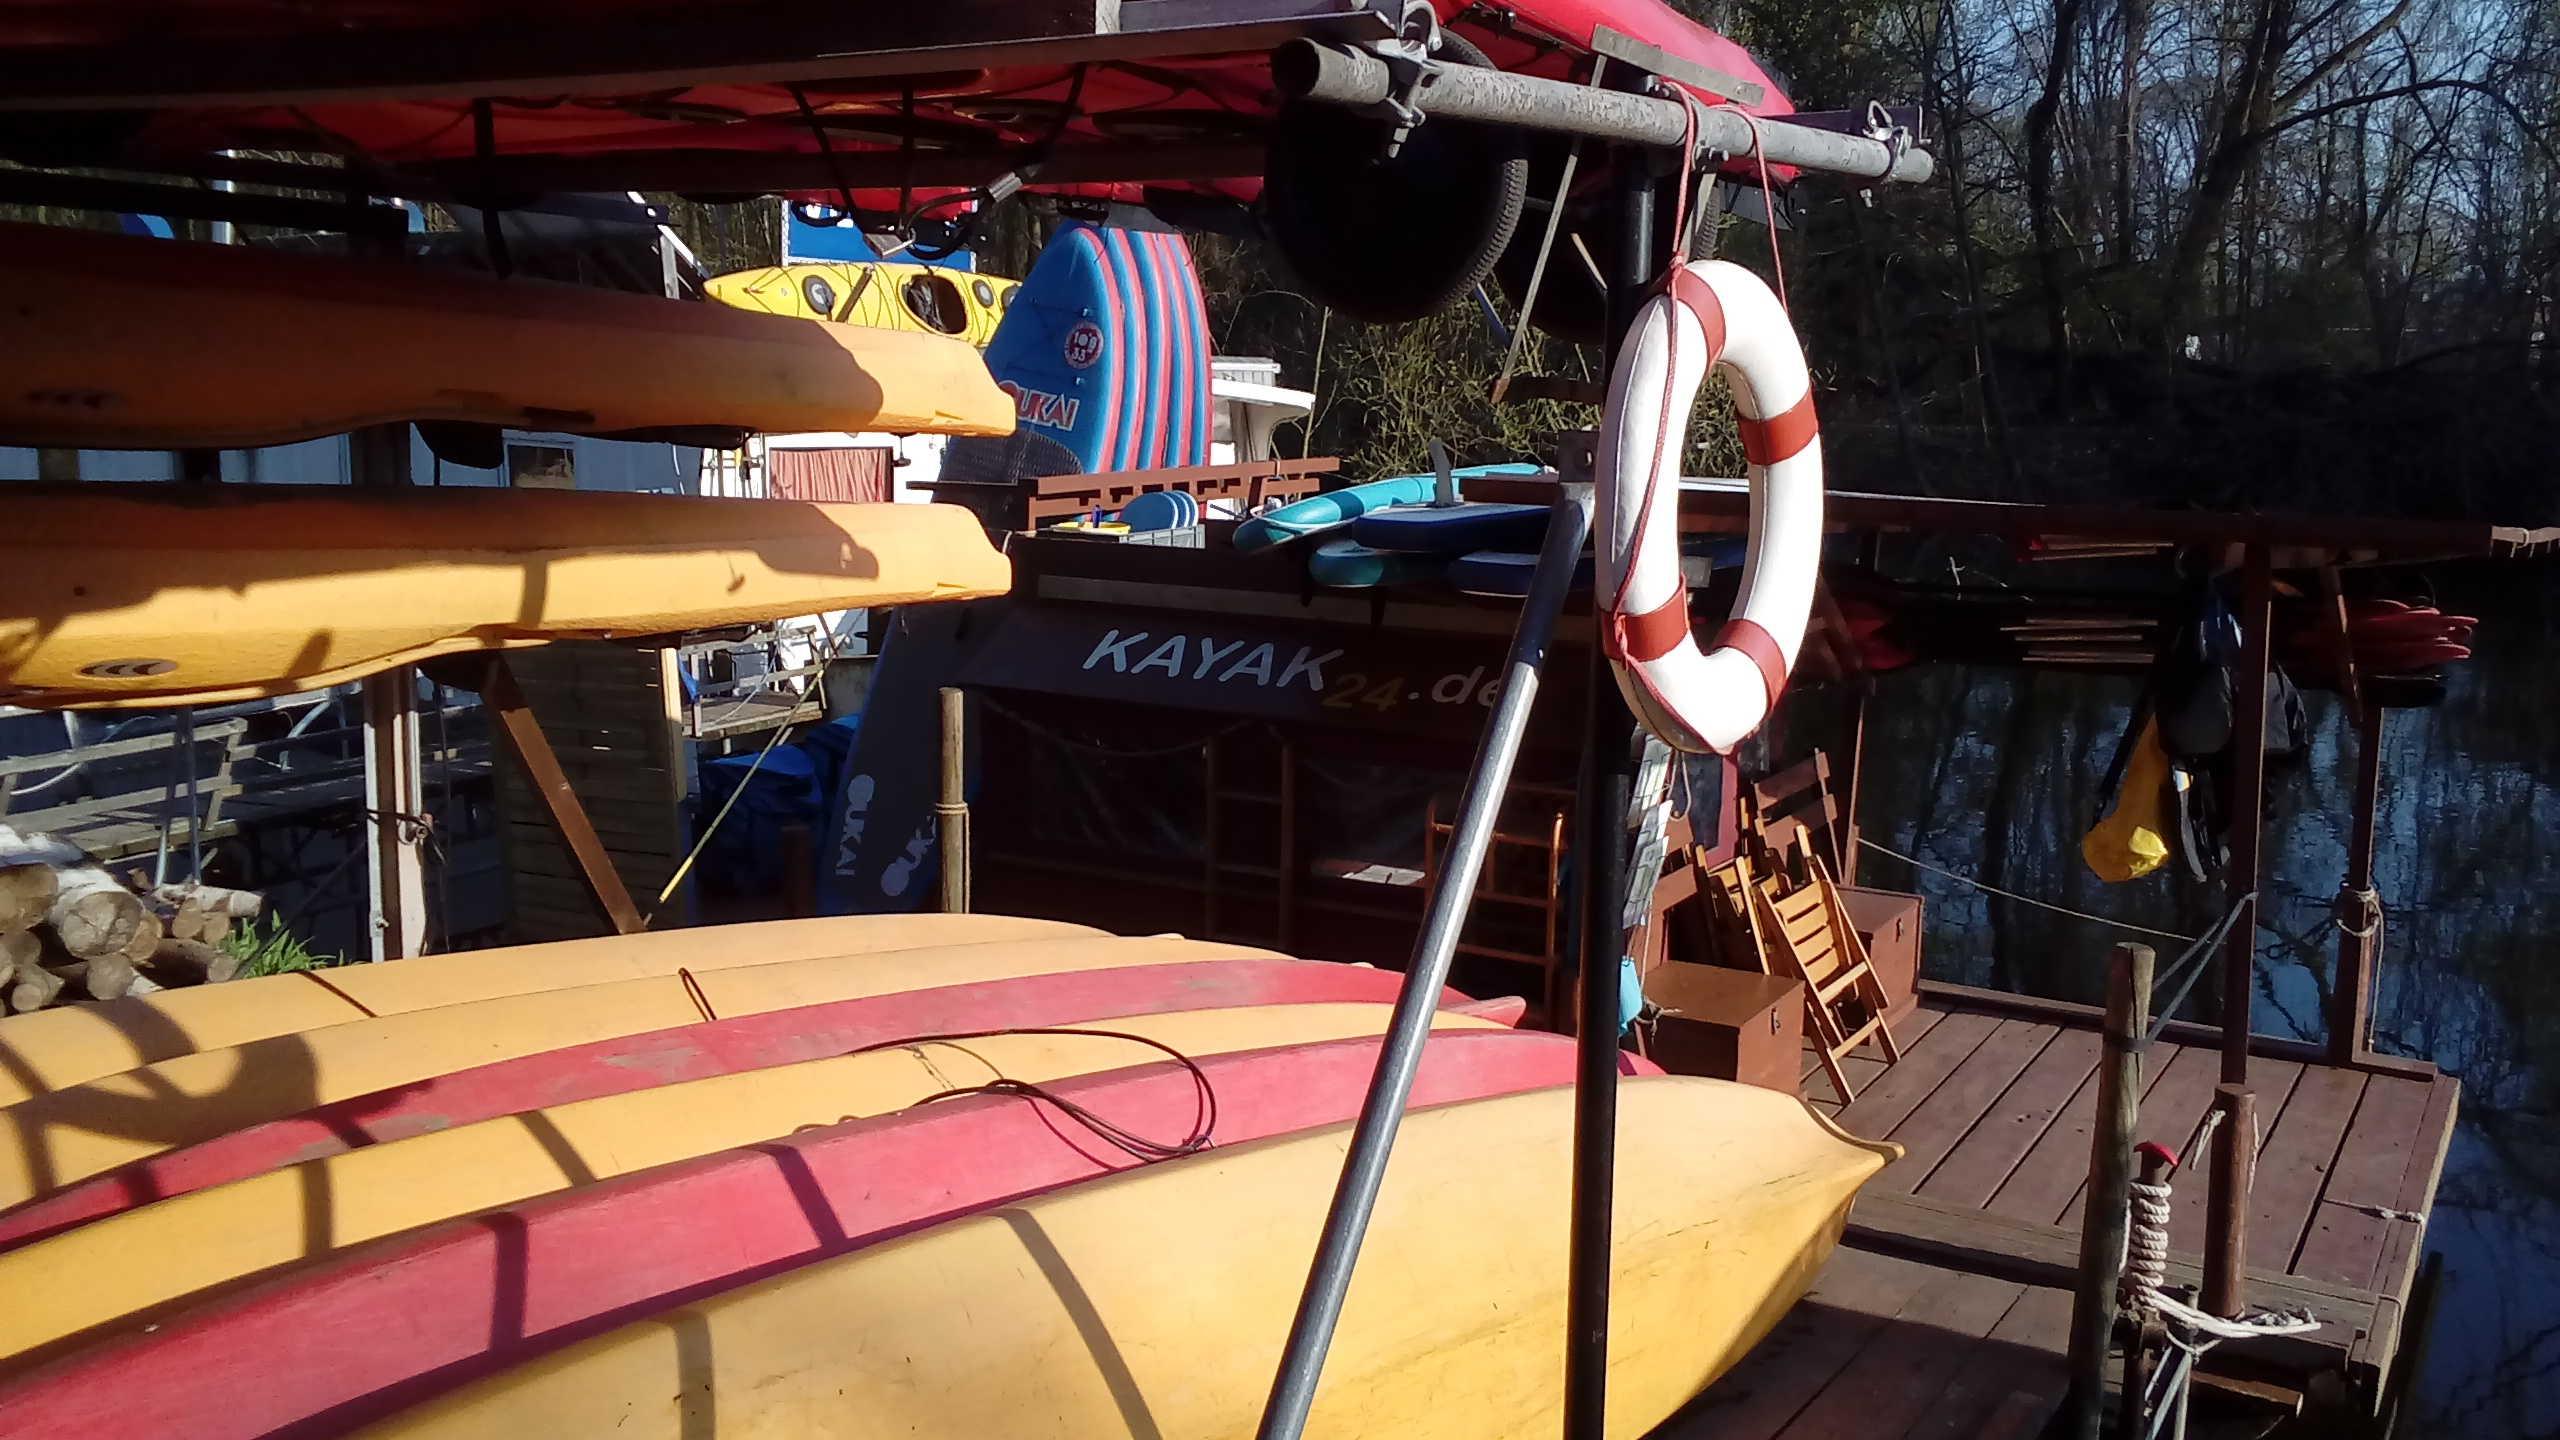 https://kayak24.de/wp-content/uploads/2019/04/Kajak_Kanu_SUP_Verleih_Brandenburg_Potsdam.jpg